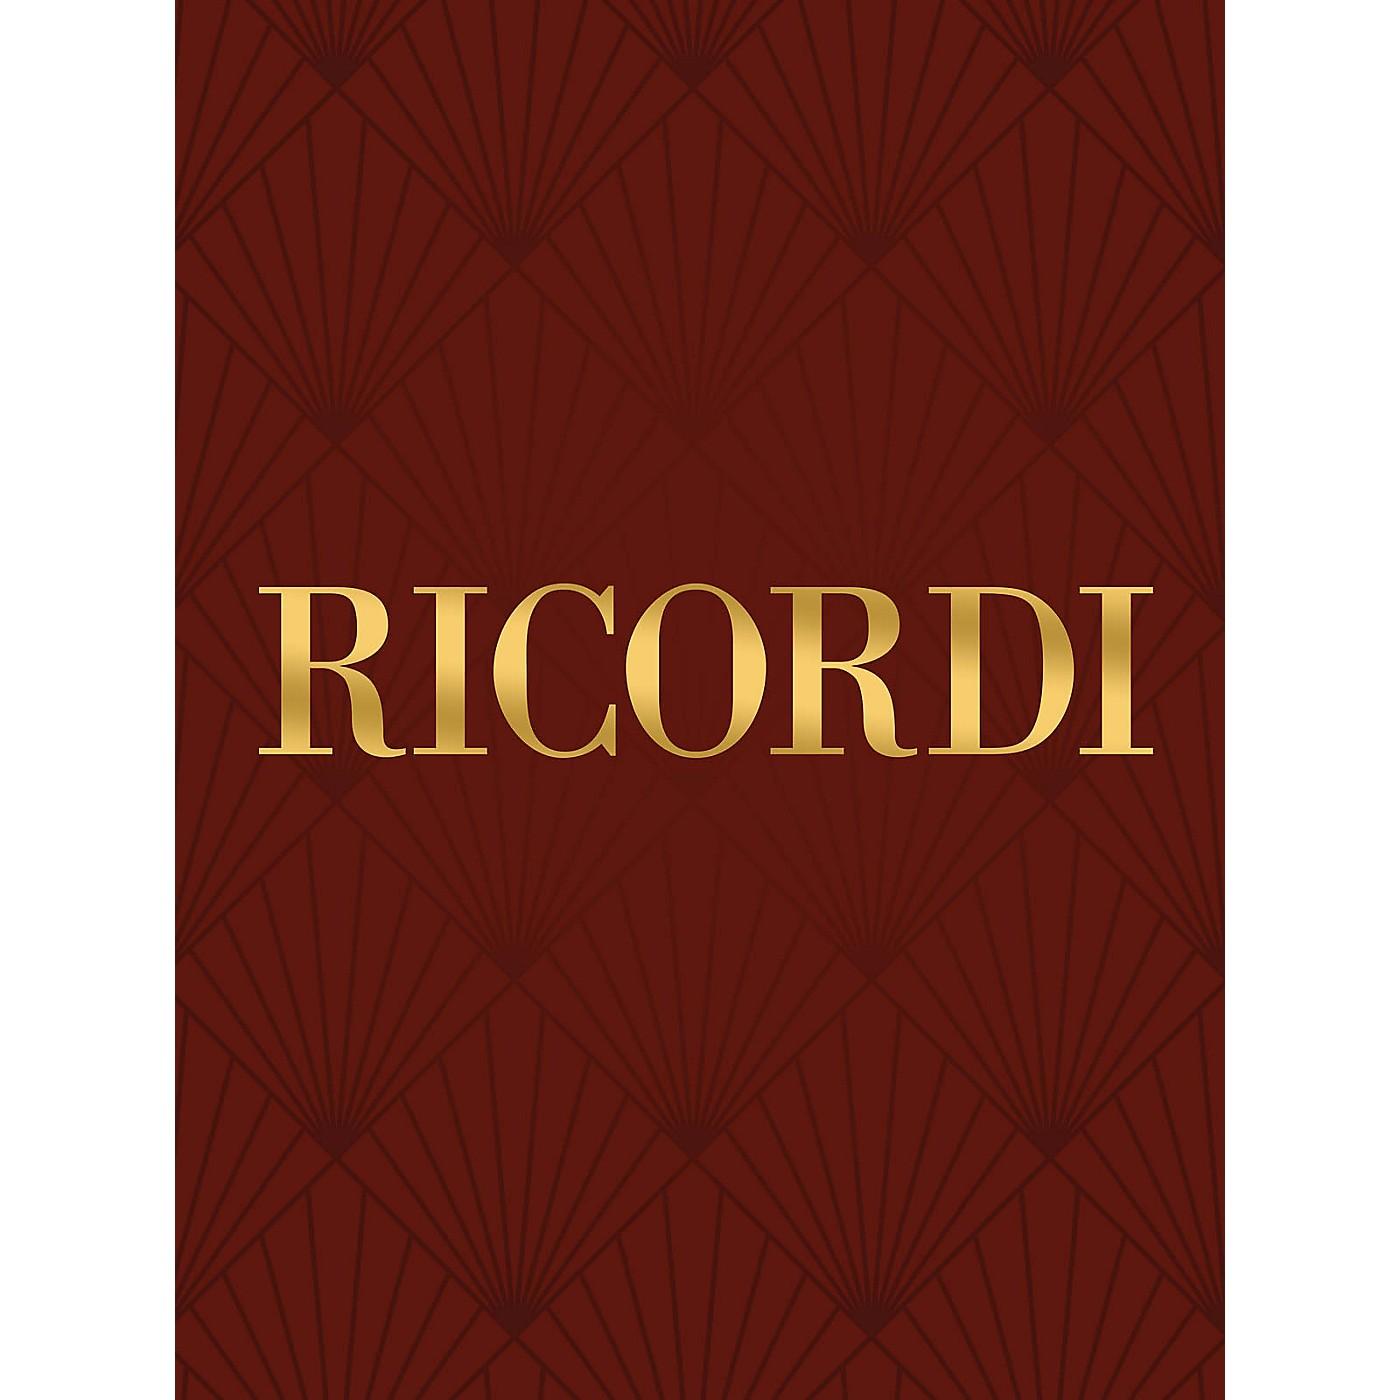 Ricordi Messa Da Requiem (Requiem Mass) (Vocal Score Latin/English) Vocal Score Composed by Giuseppe Verdi thumbnail